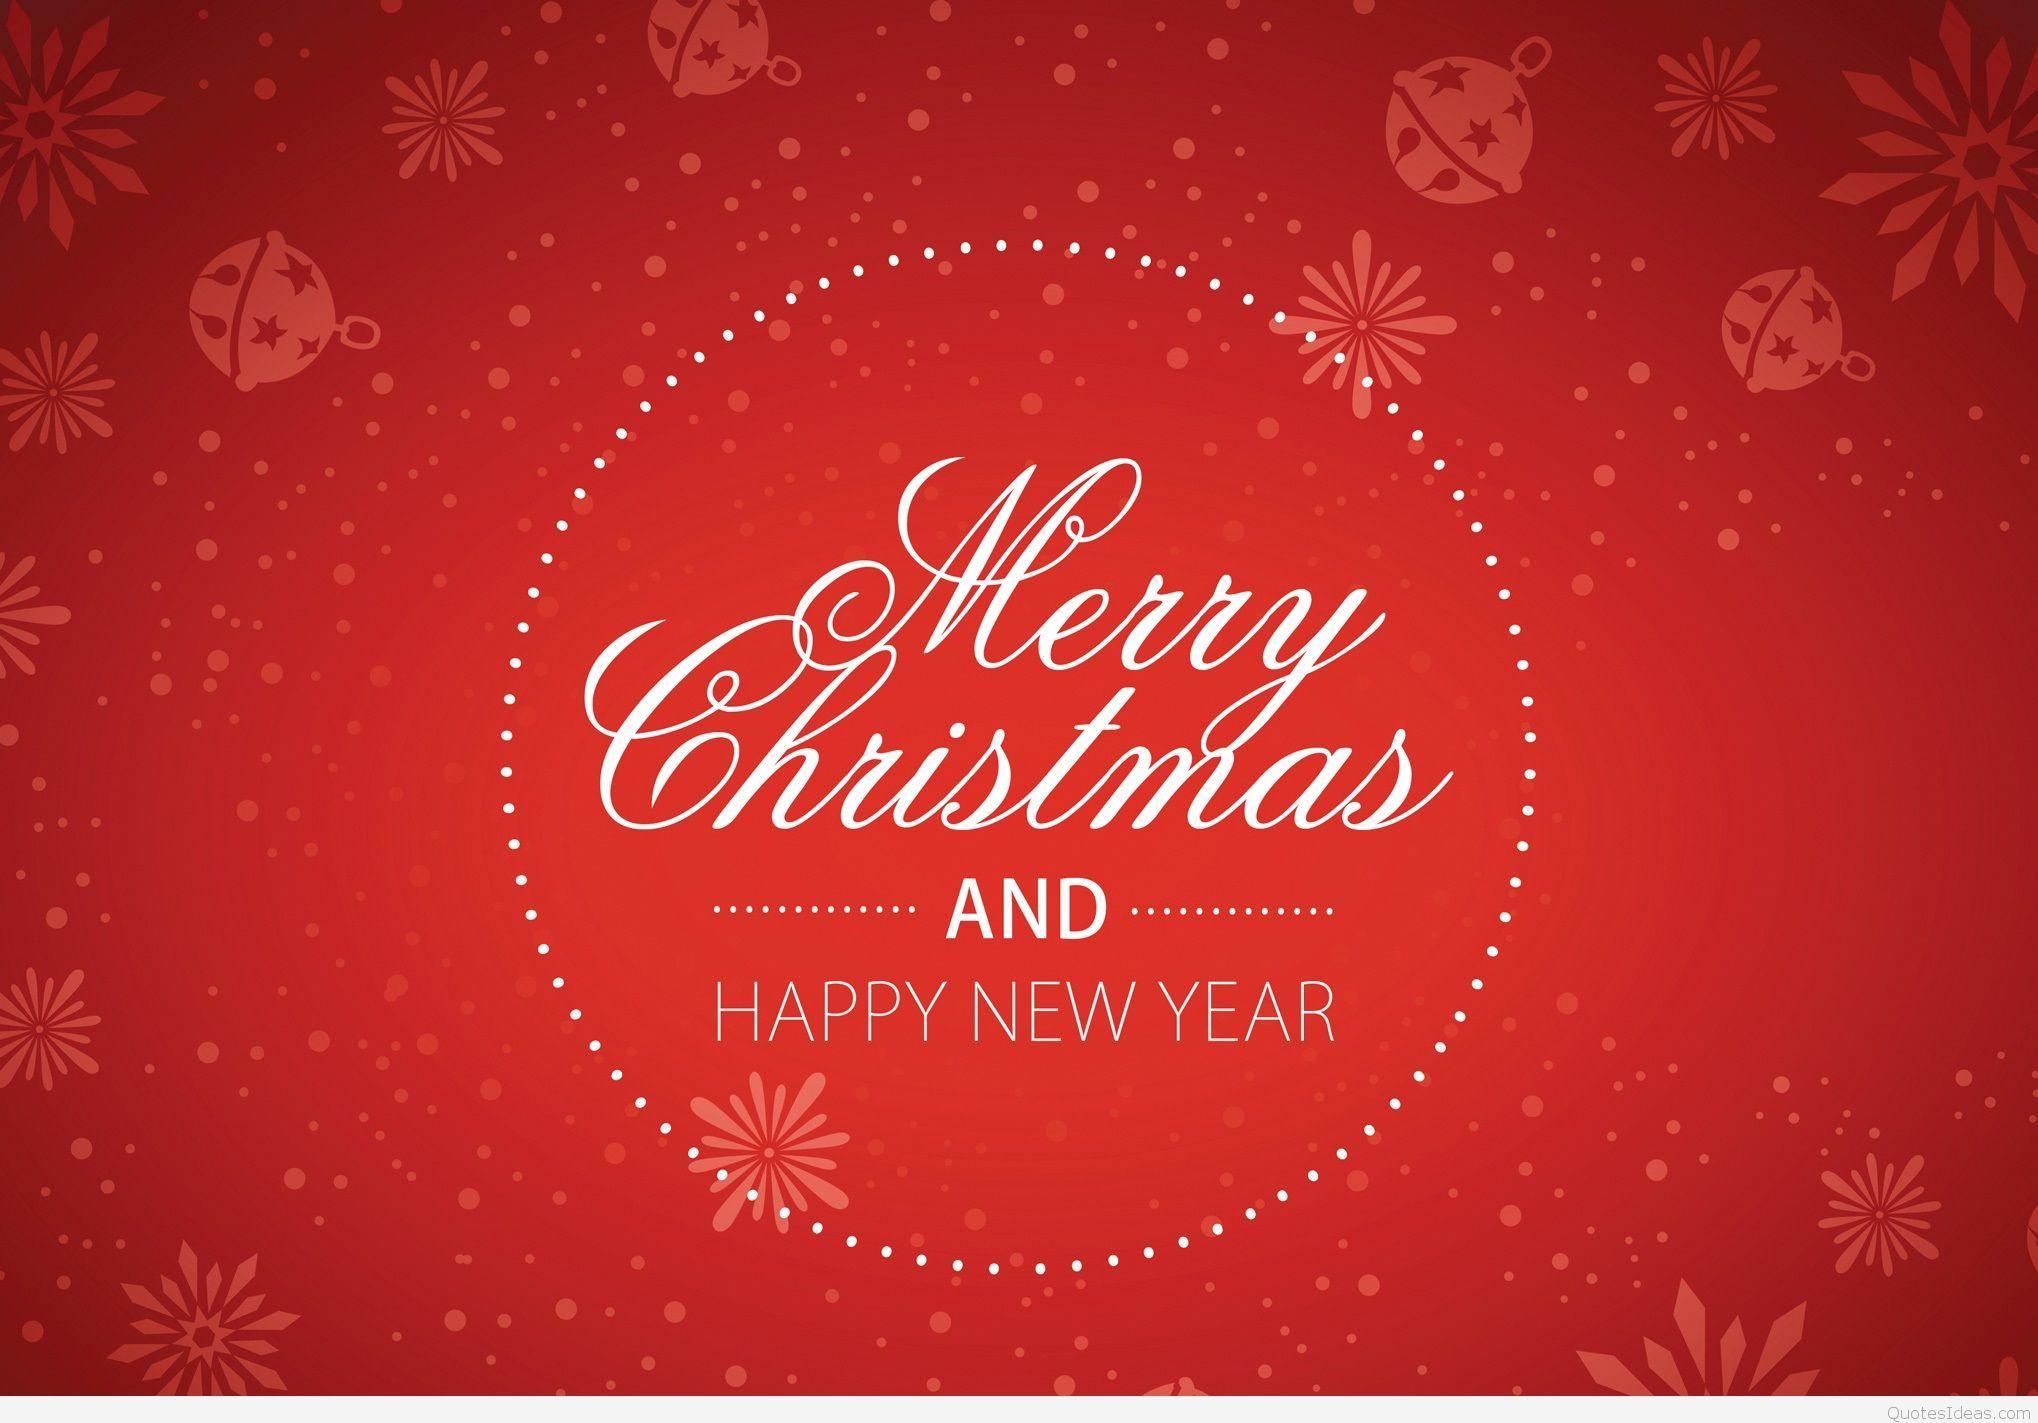 merry christmas happy new year desktop background